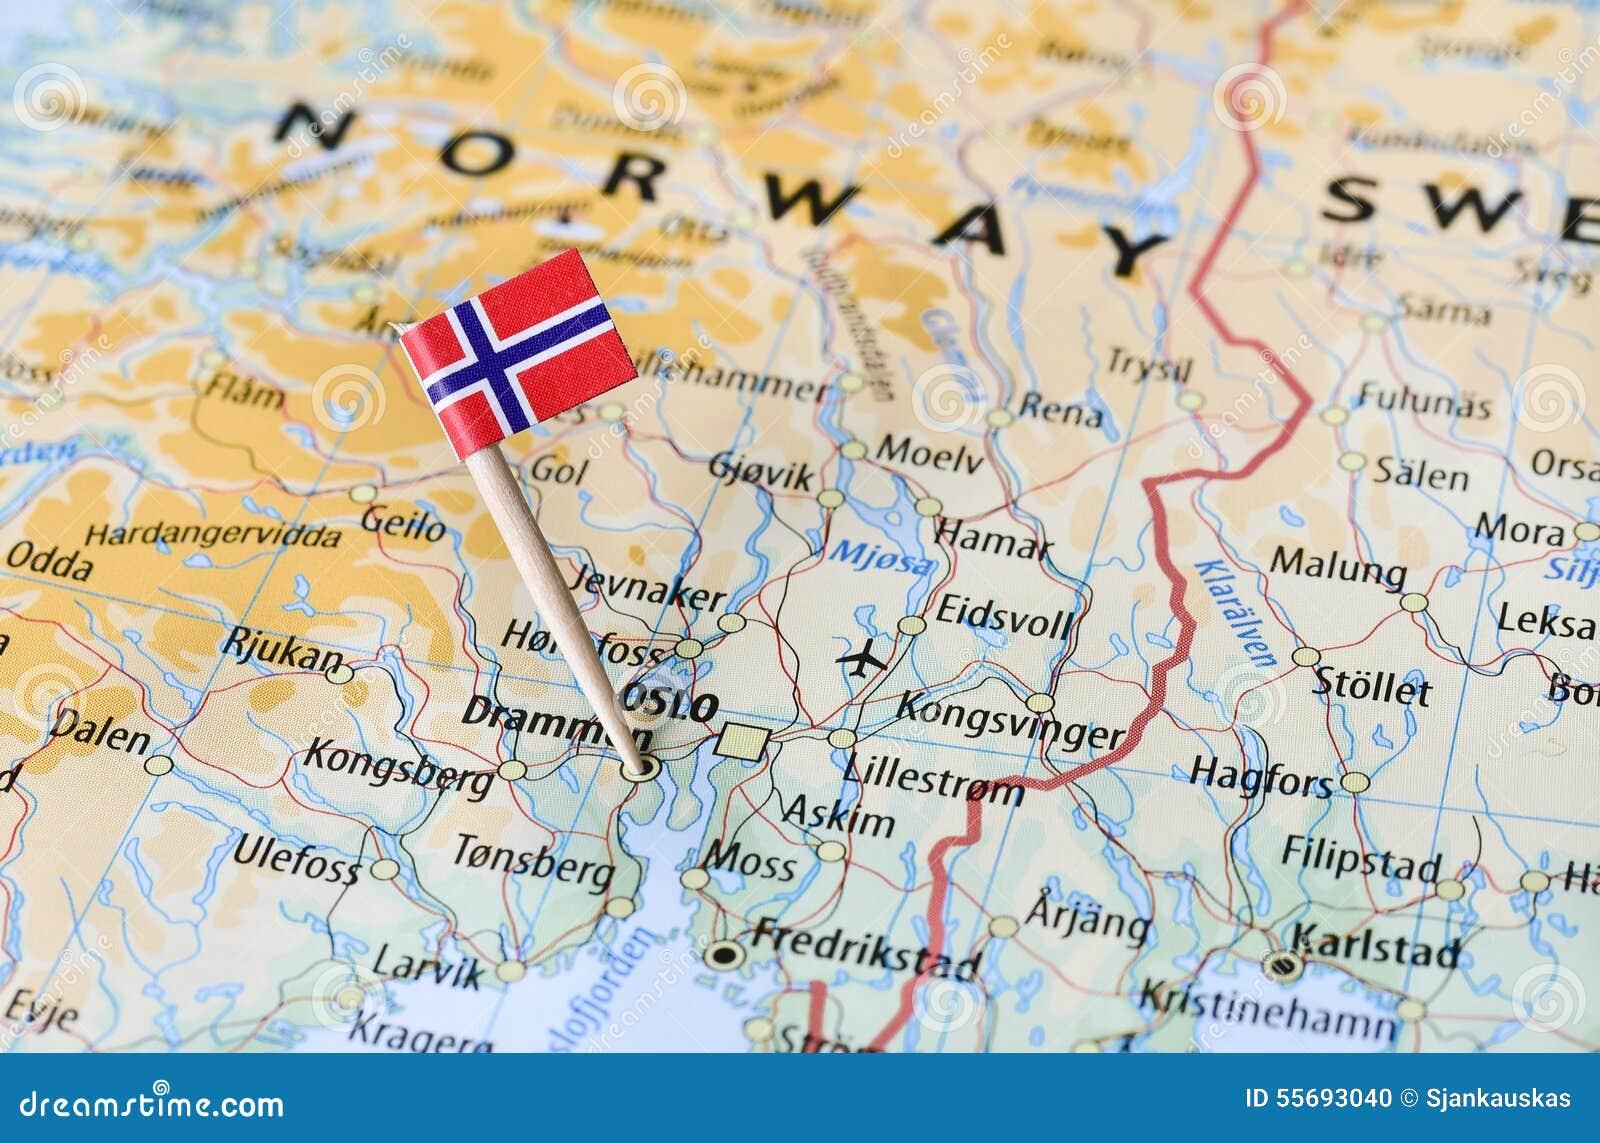 Norway flag on map stock photo Image of europe region 55693040